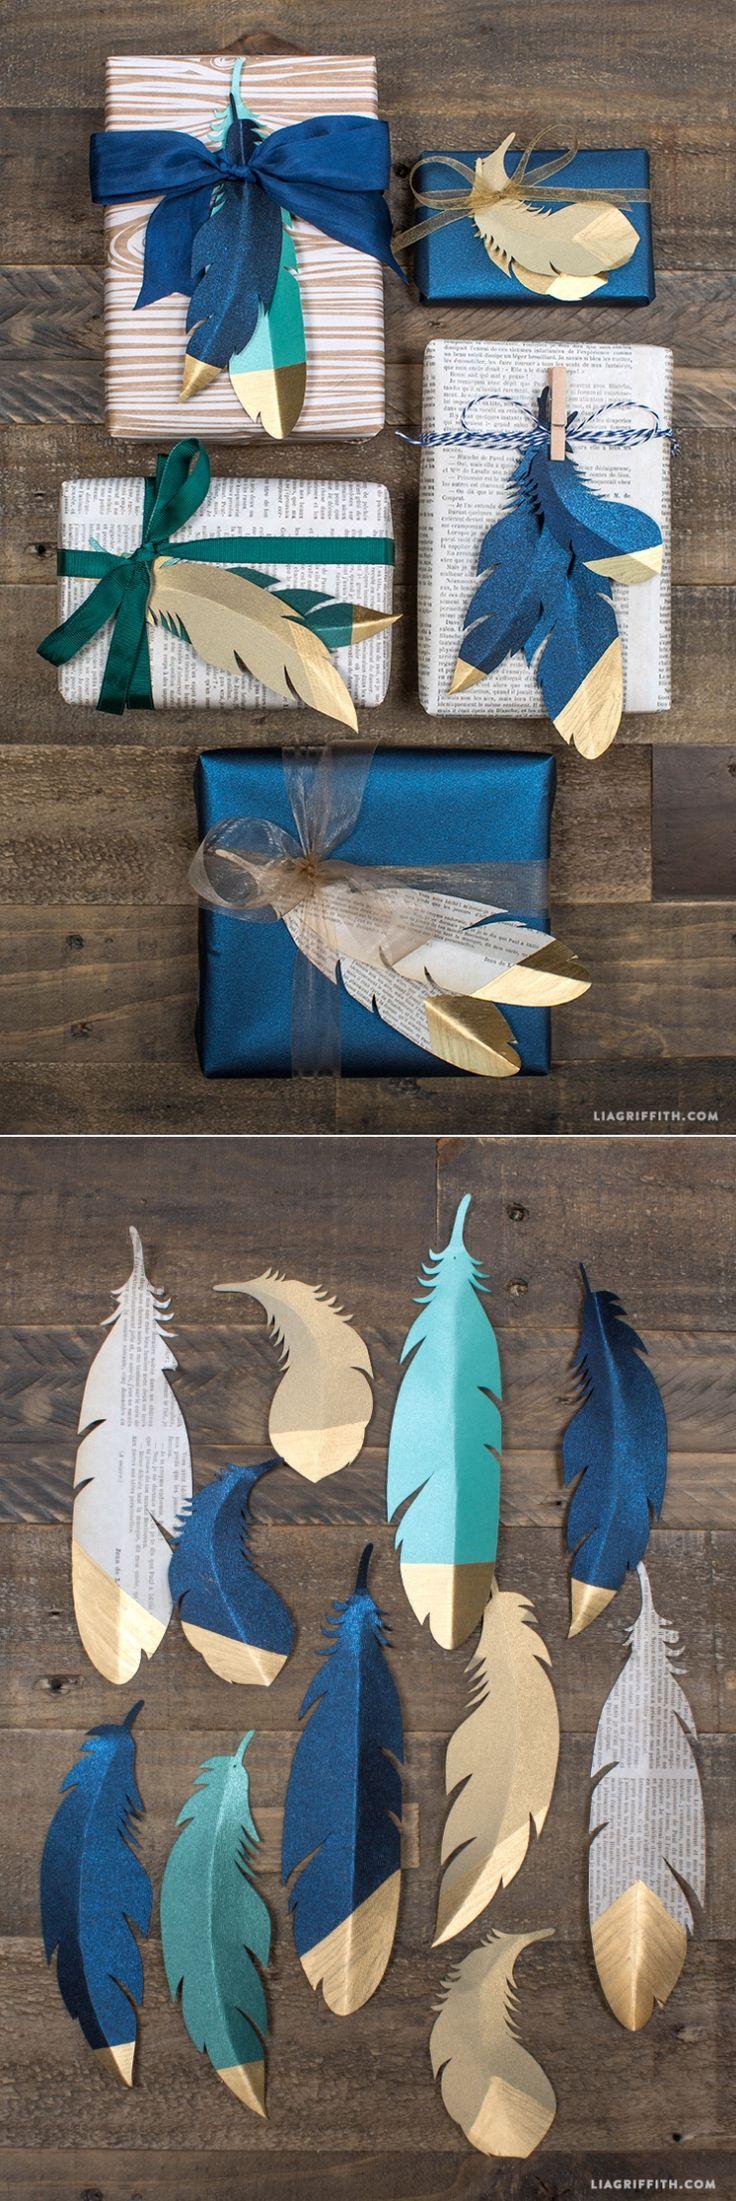 emballage-plumes-cadeaux.jpg